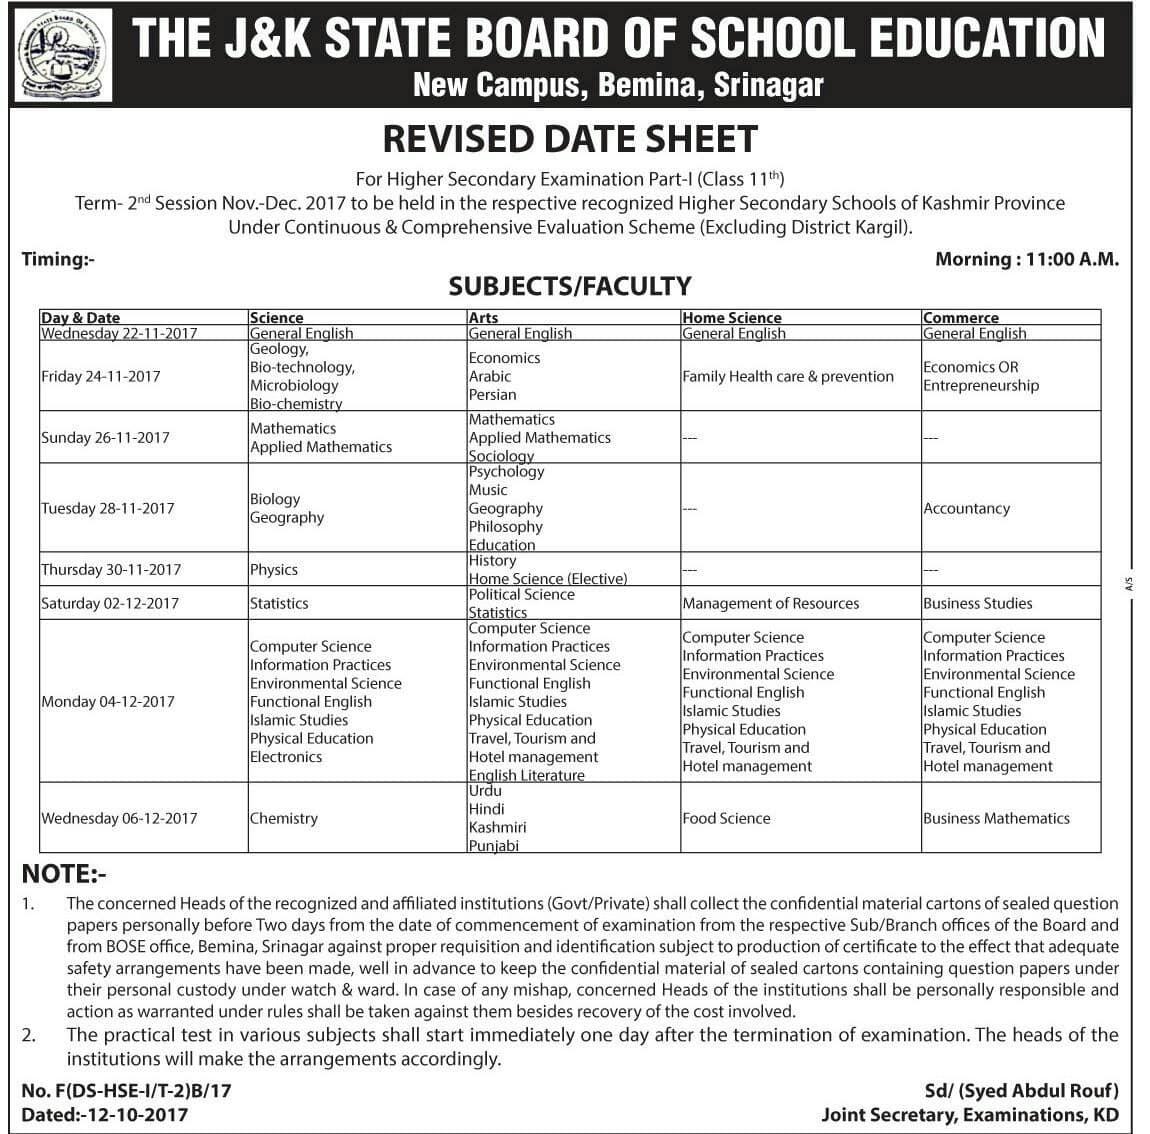 JKBOSE Revised Date Sheet for Class 11th T2 Exam (Nov-Dec 2017)